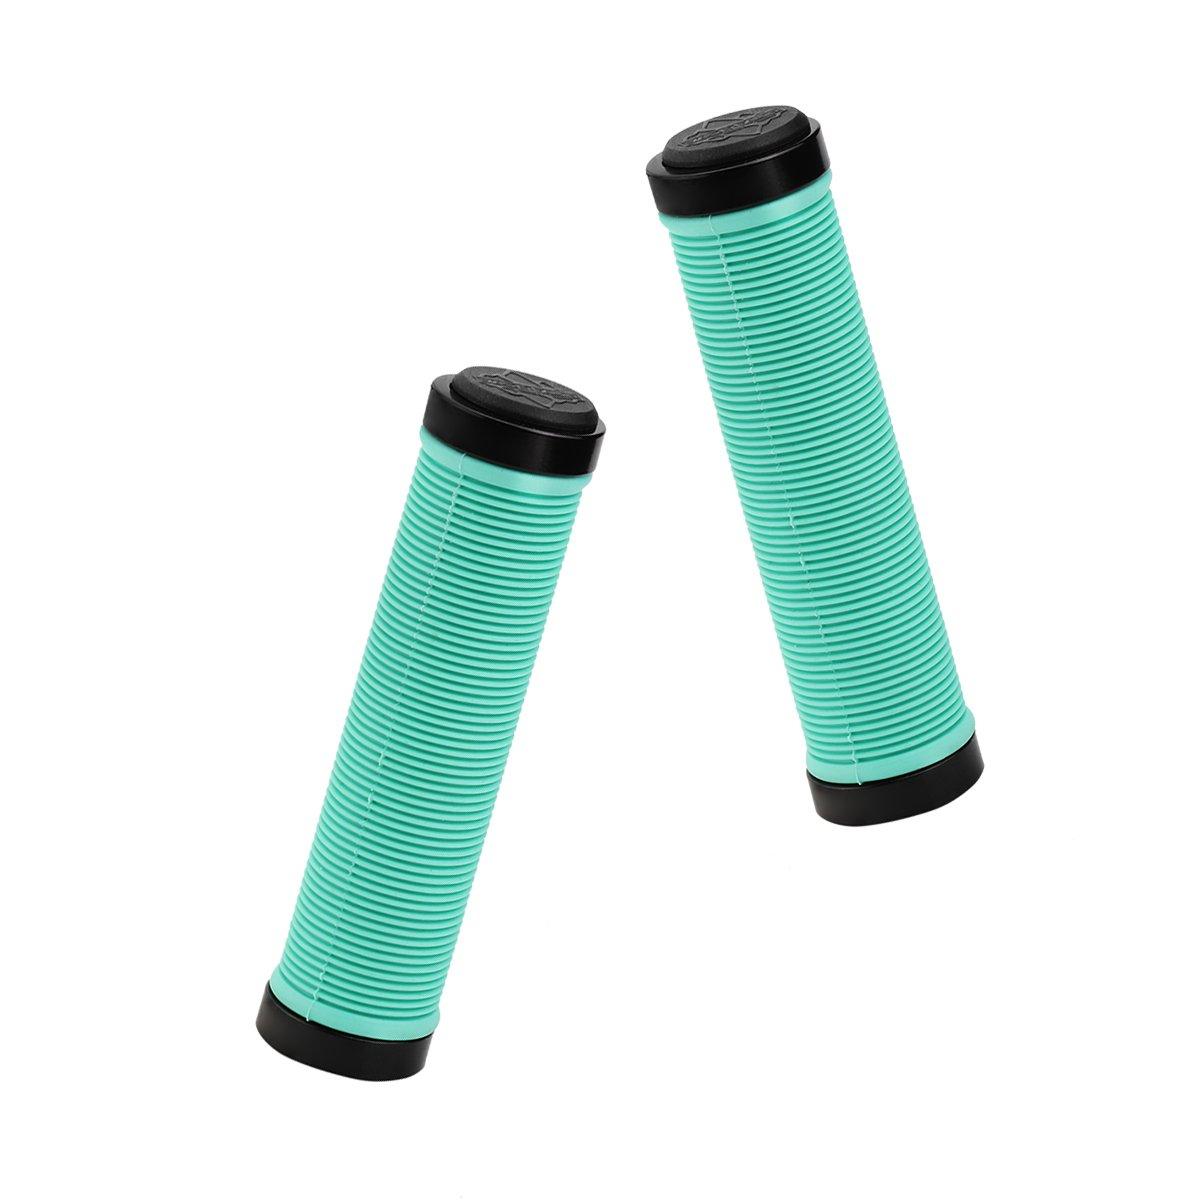 She-Lin Bike Handlebar Grips - Double Lock-on Bicycle Grip Handle Bar Nonslip Rubber End Holding Locking Grips, for MTB, BMX, Mountain, Downhill, Folding Bike